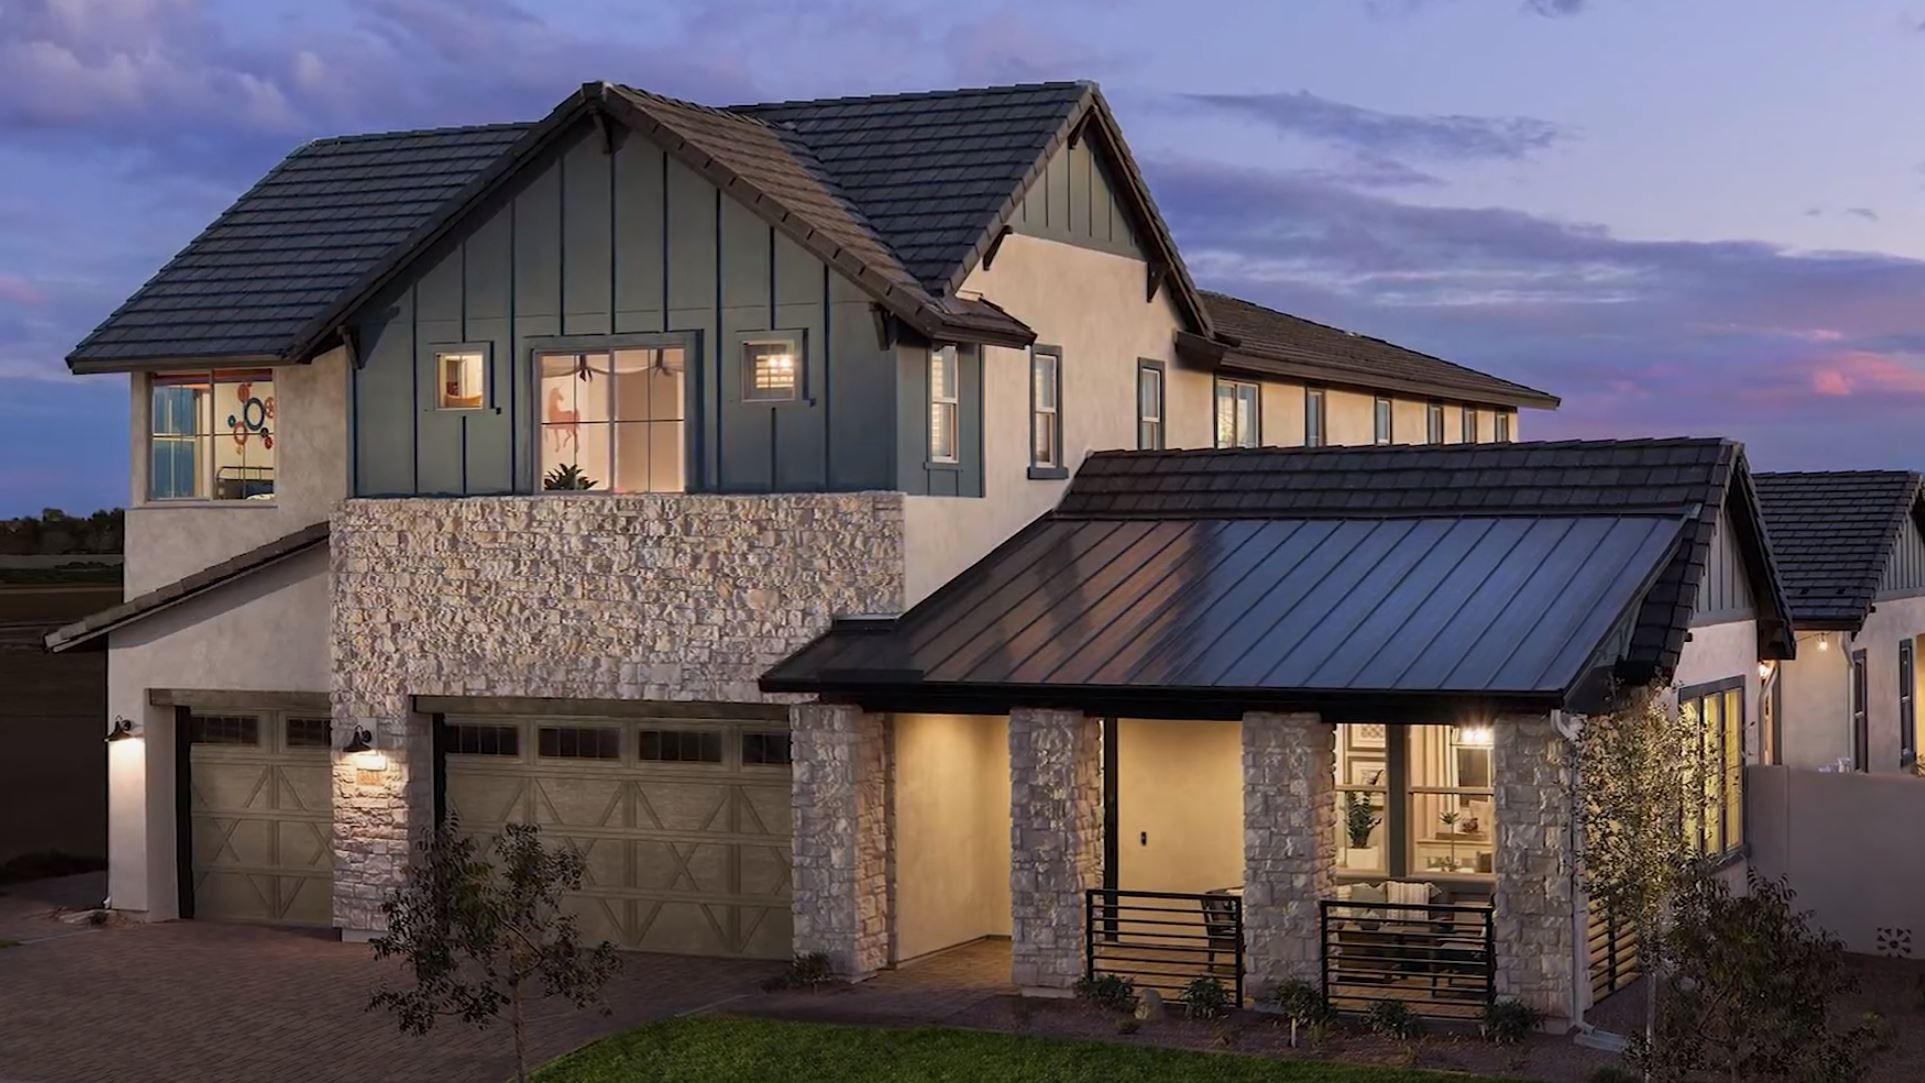 Gilbert home, Cost of Living in Gilbert Arizona, Living in Phoenix real estate